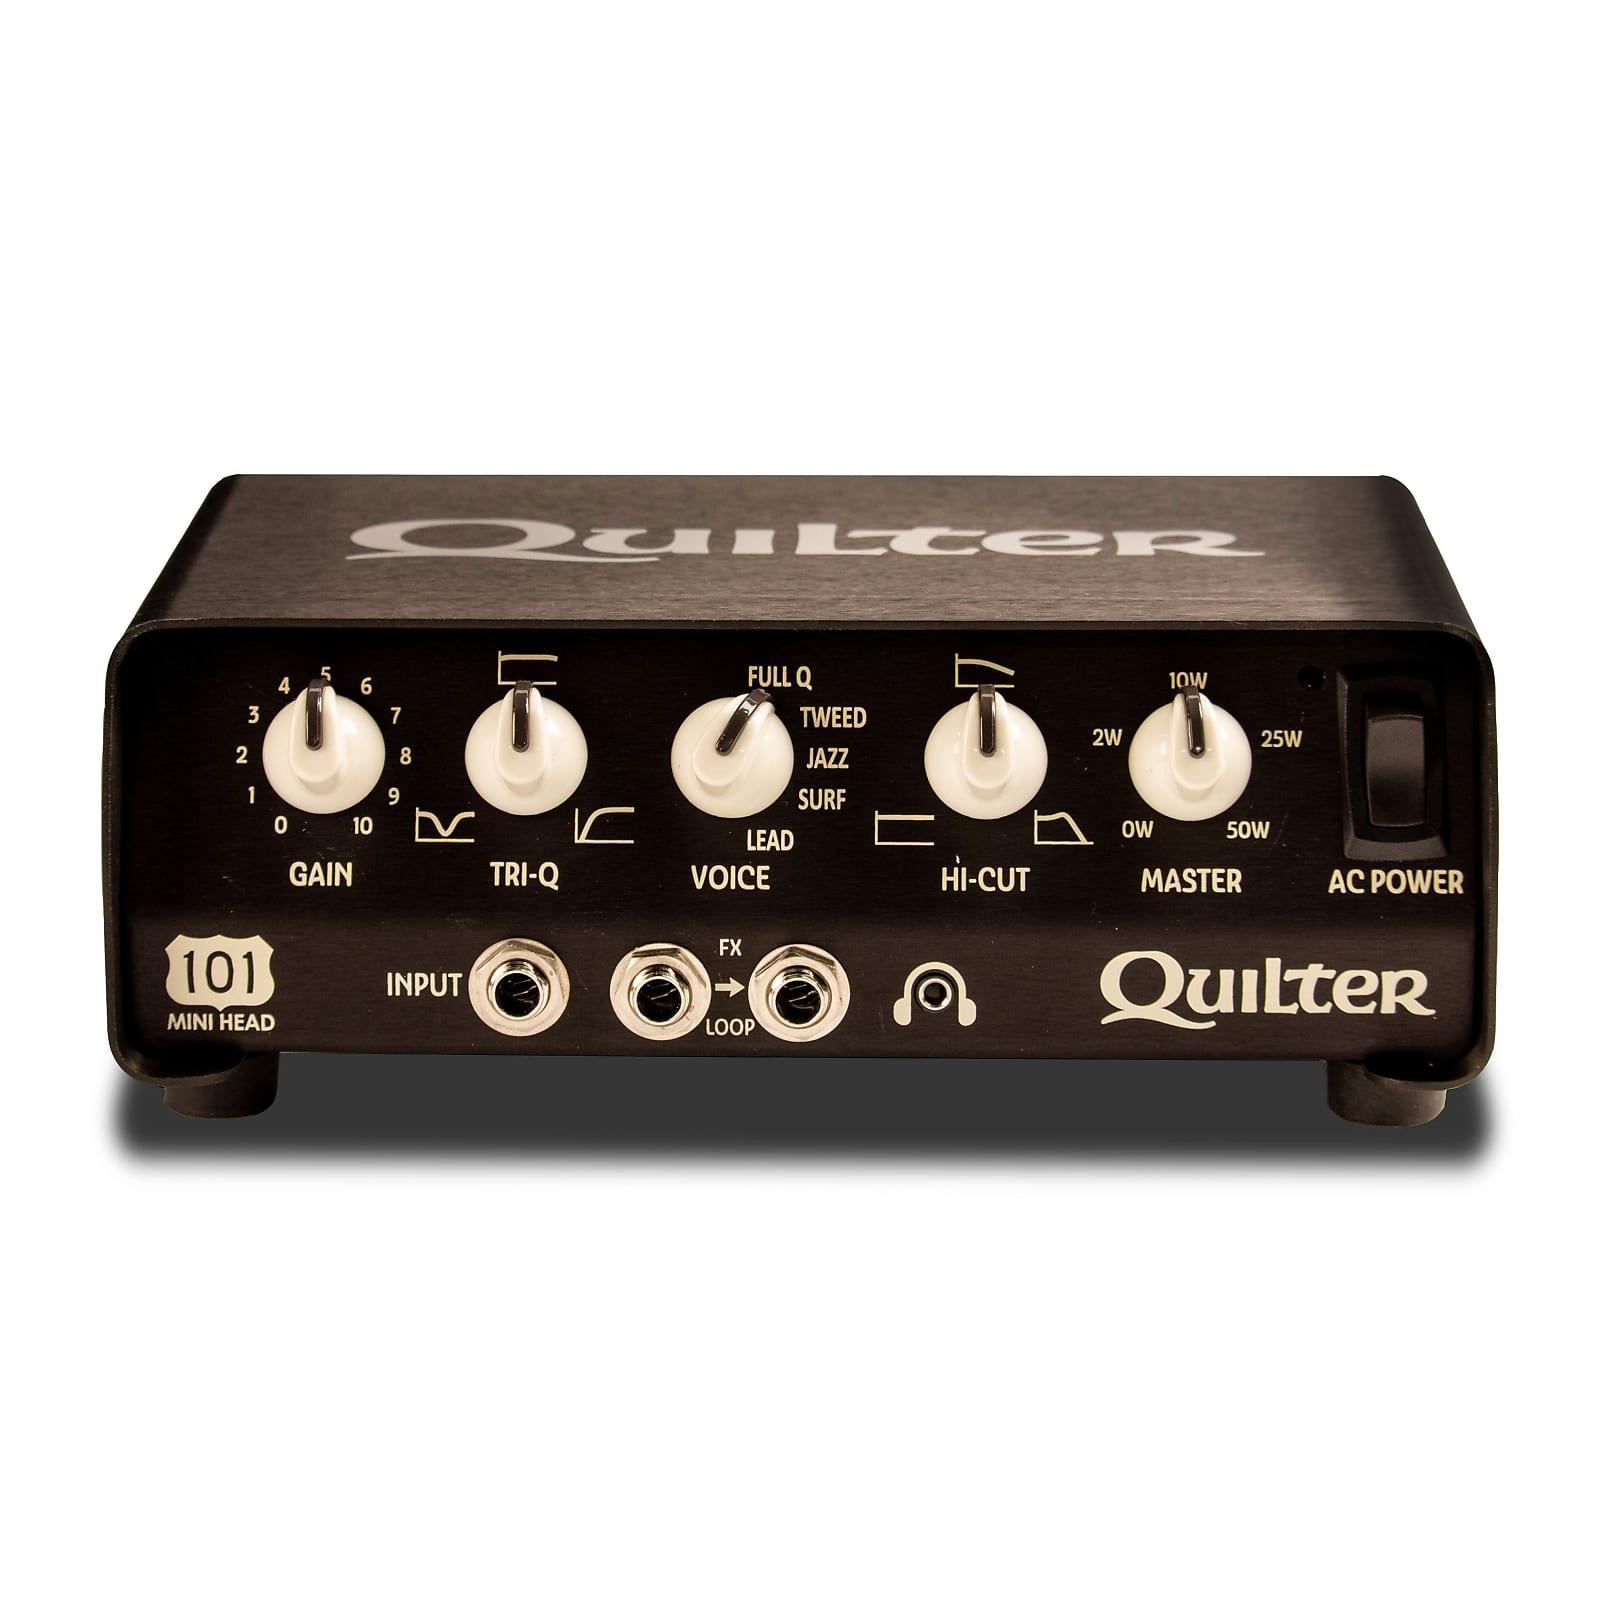 Quilter 101 Mini 50W Guitar Amplifier Head